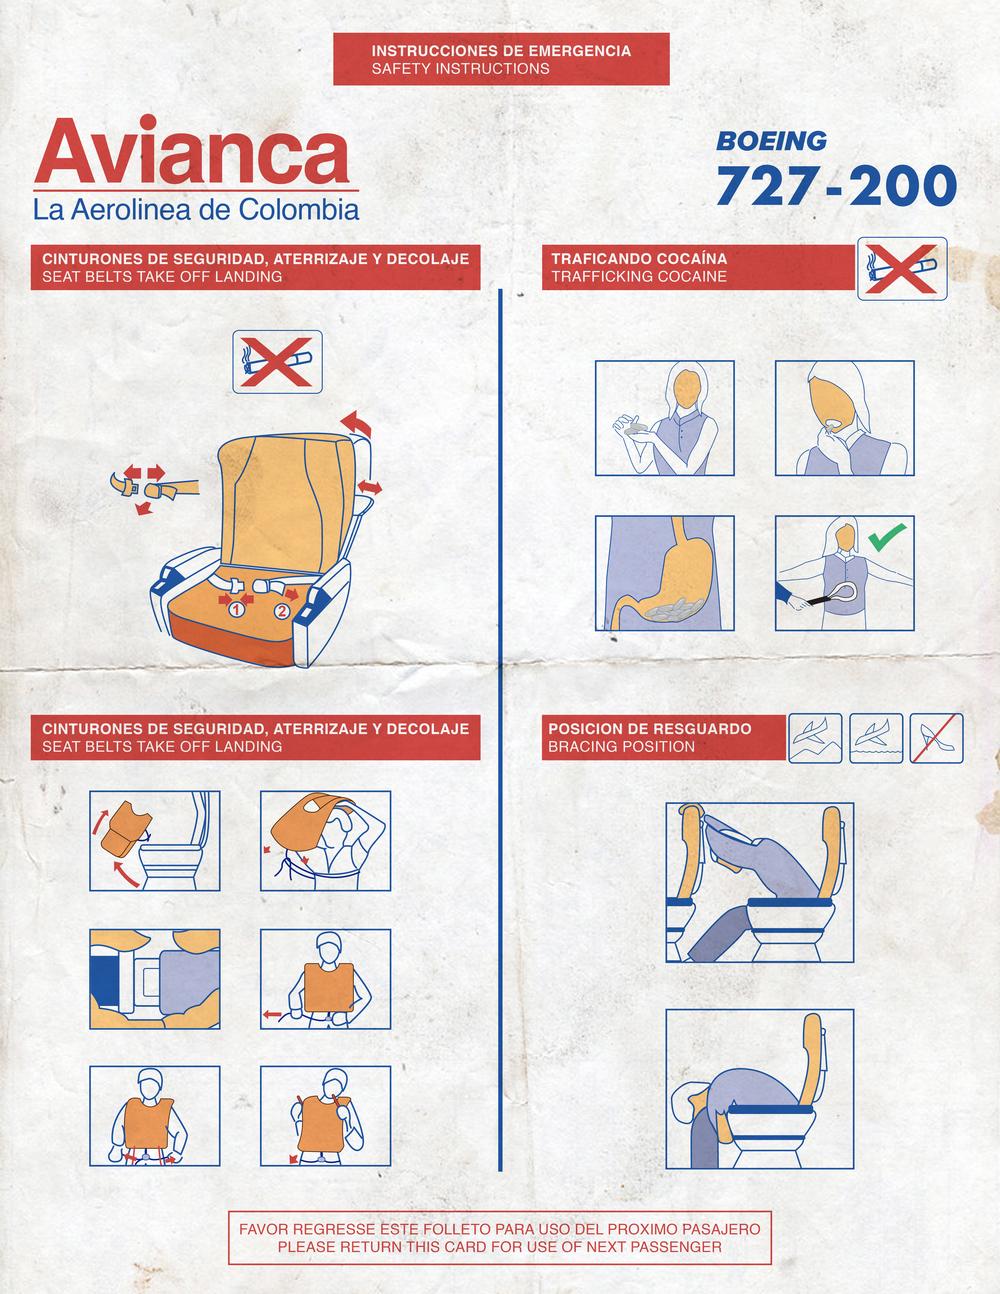 flightsafetycard.jpg